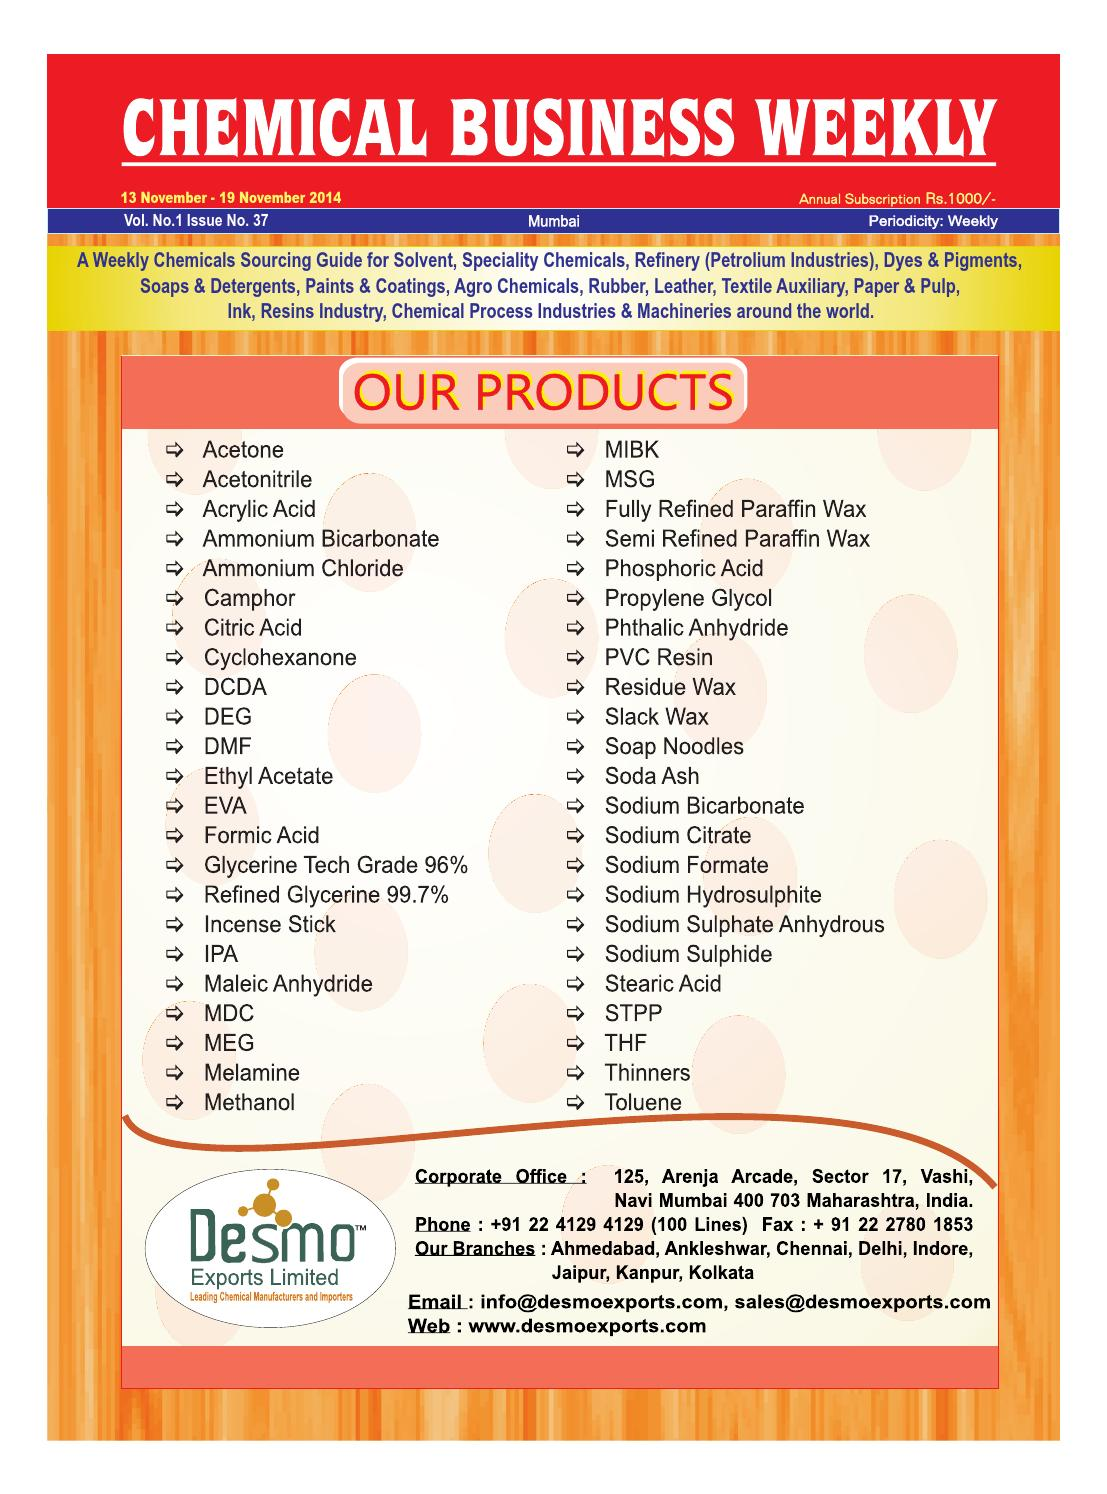 Chemical business weekly 13 nov 19 nov 2014 by The Mazada Pharma